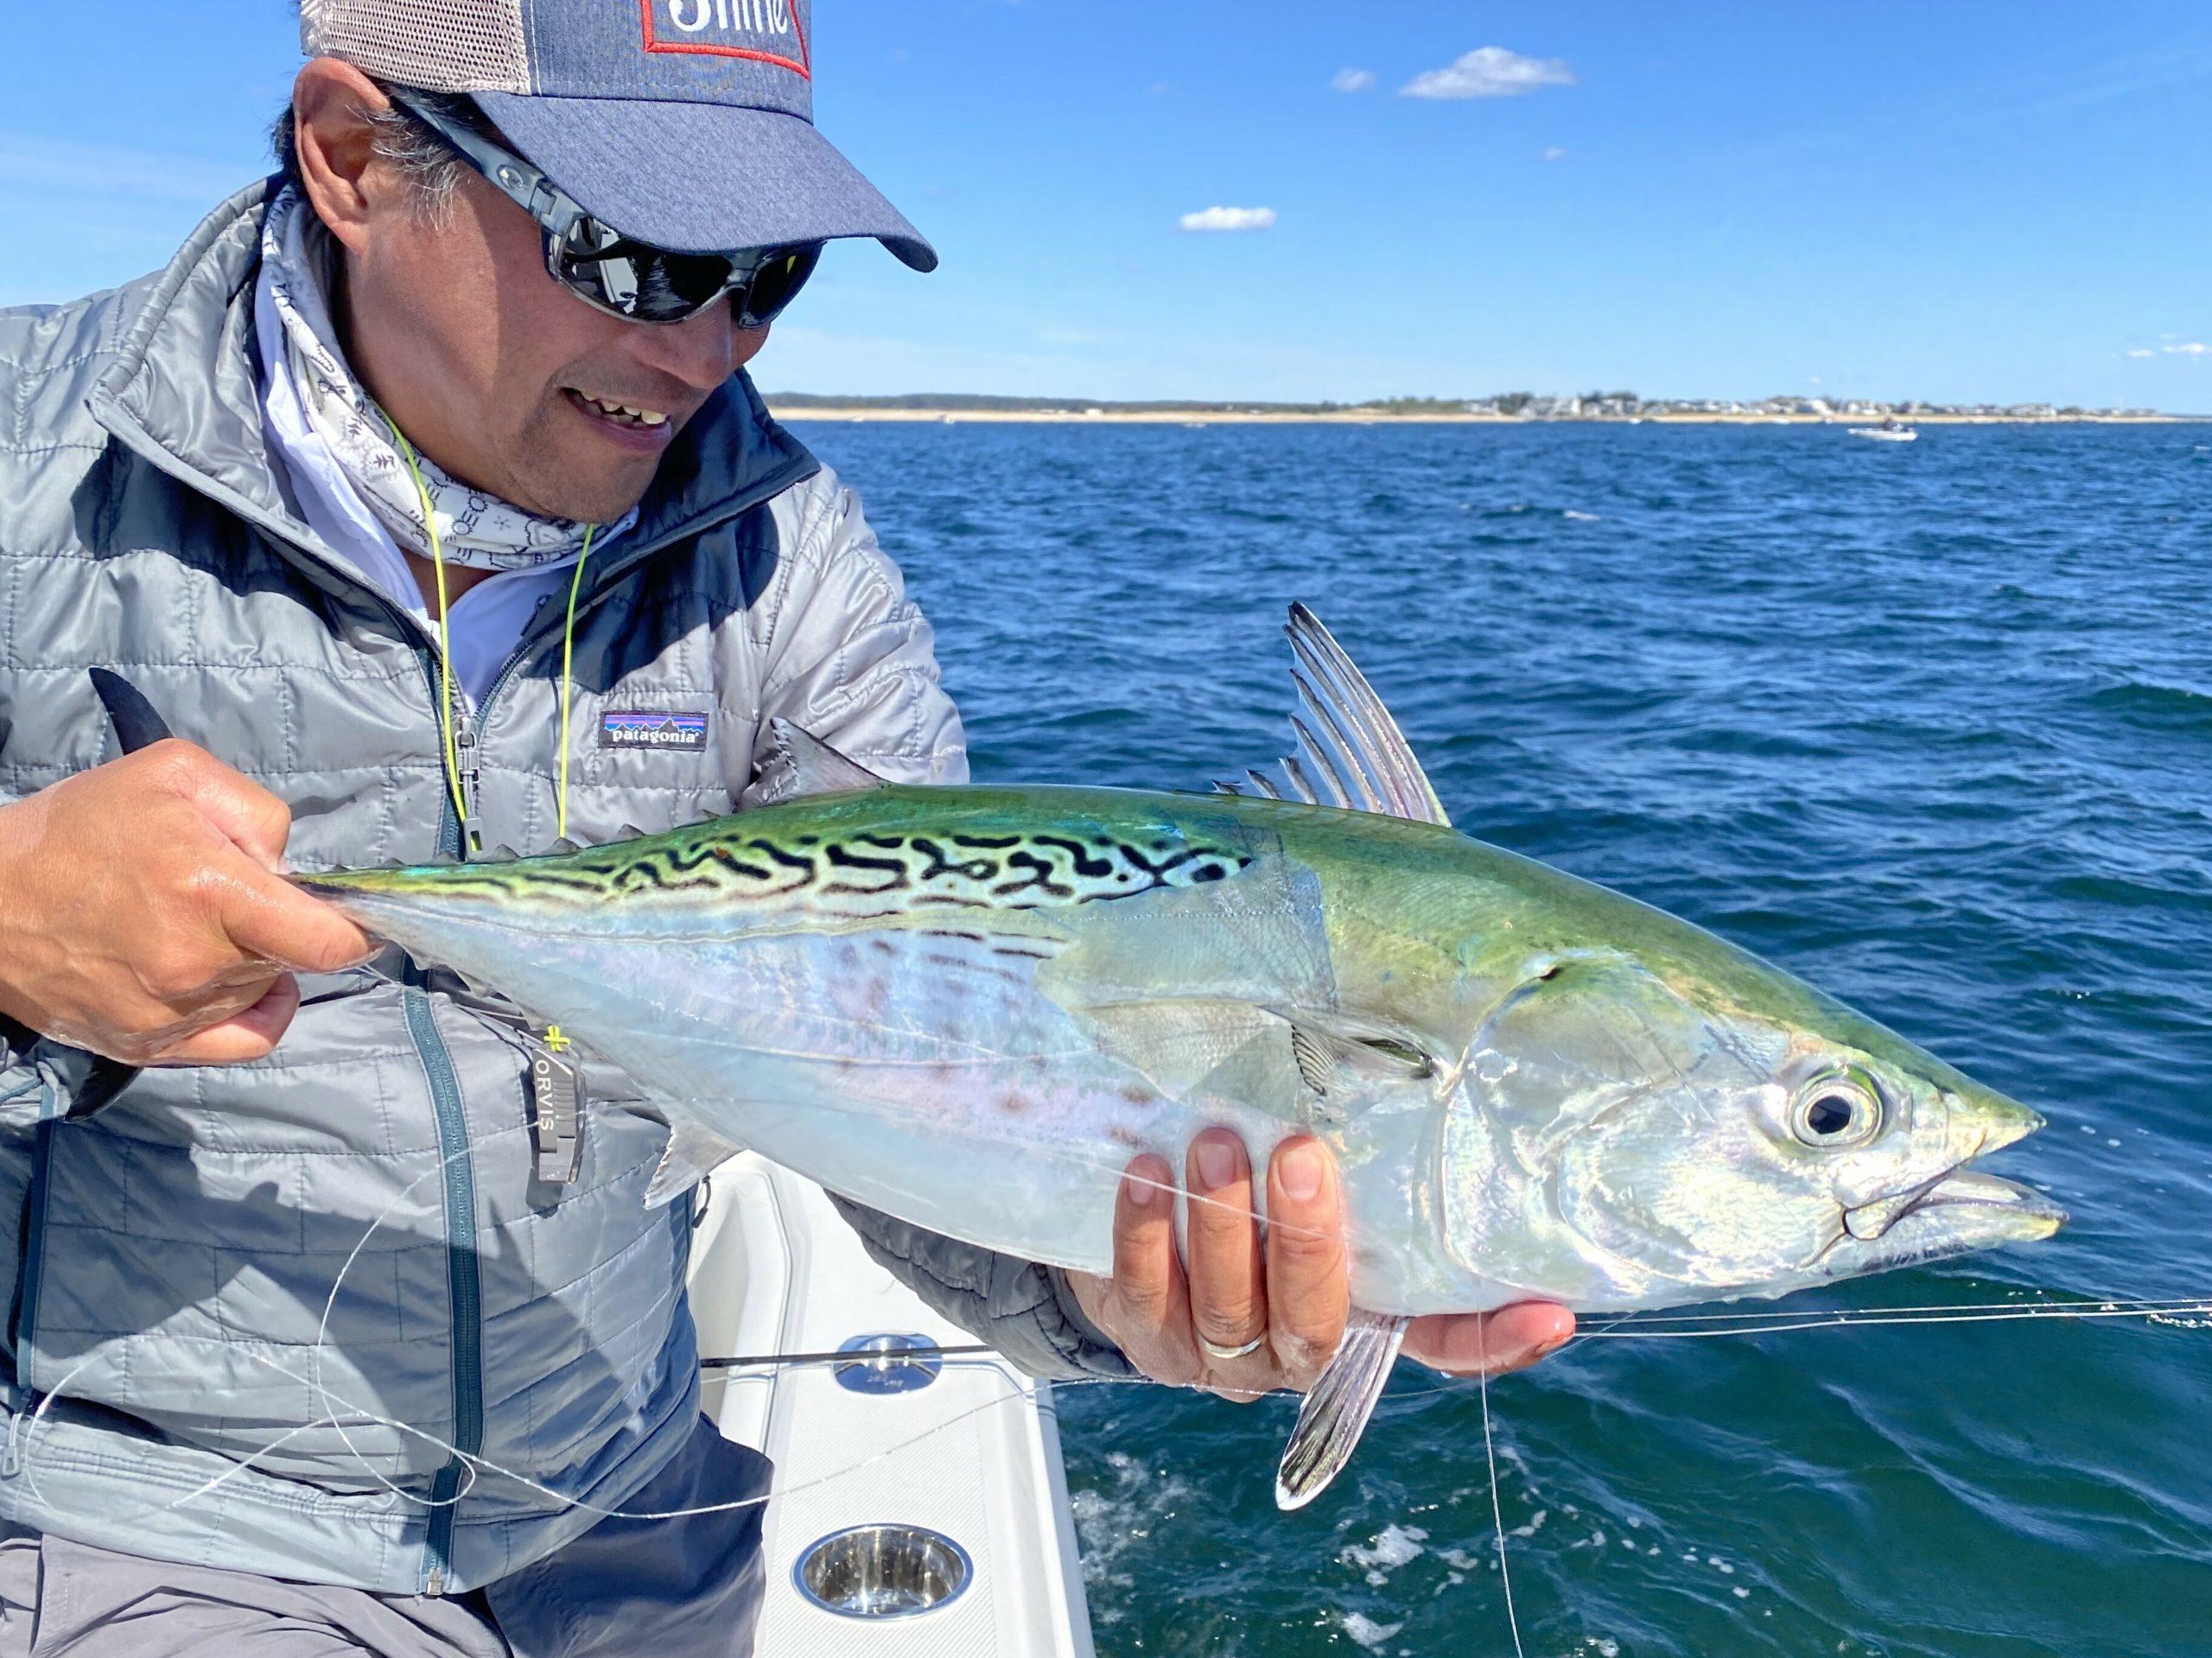 East Hampton fly fisherman Luyen Chou and longtime Montauk fly fishing guide David Blinken have teamed up to organize a virtual seminar series starting this week called